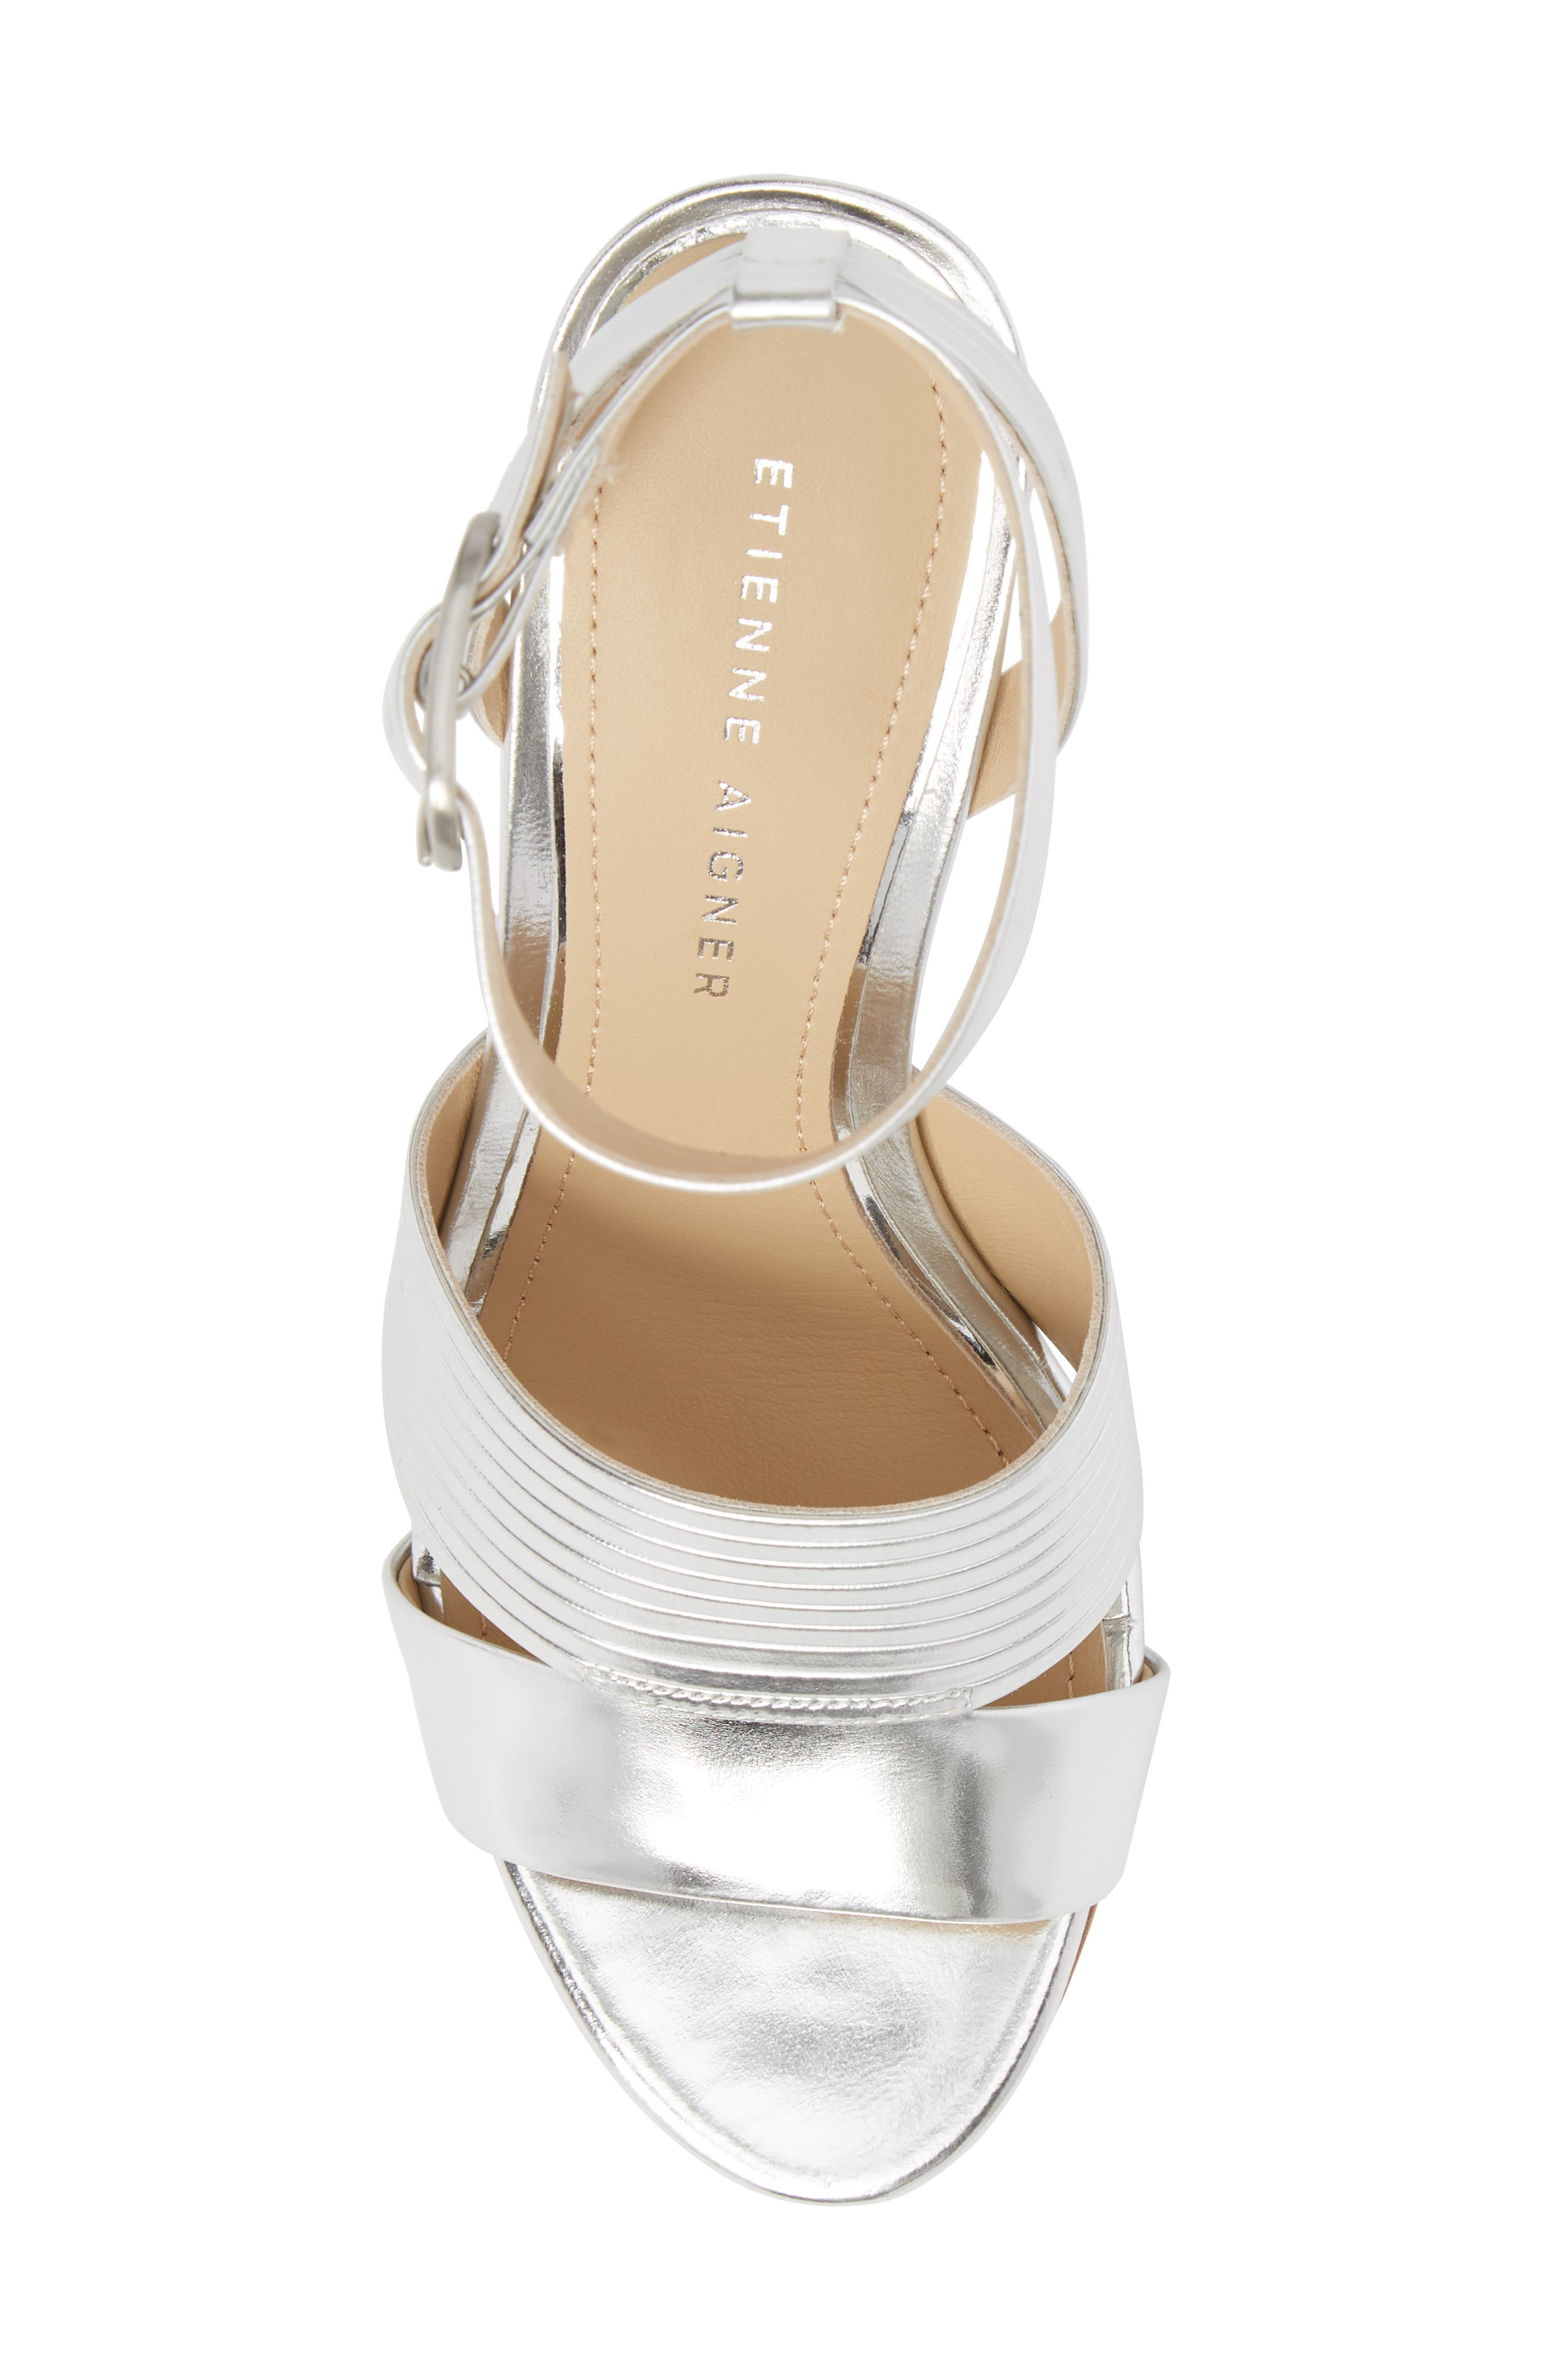 ETIENNE AIGNER,                             Layla Ankle Strap Sandal,                             Alternate thumbnail 5, color,                             040